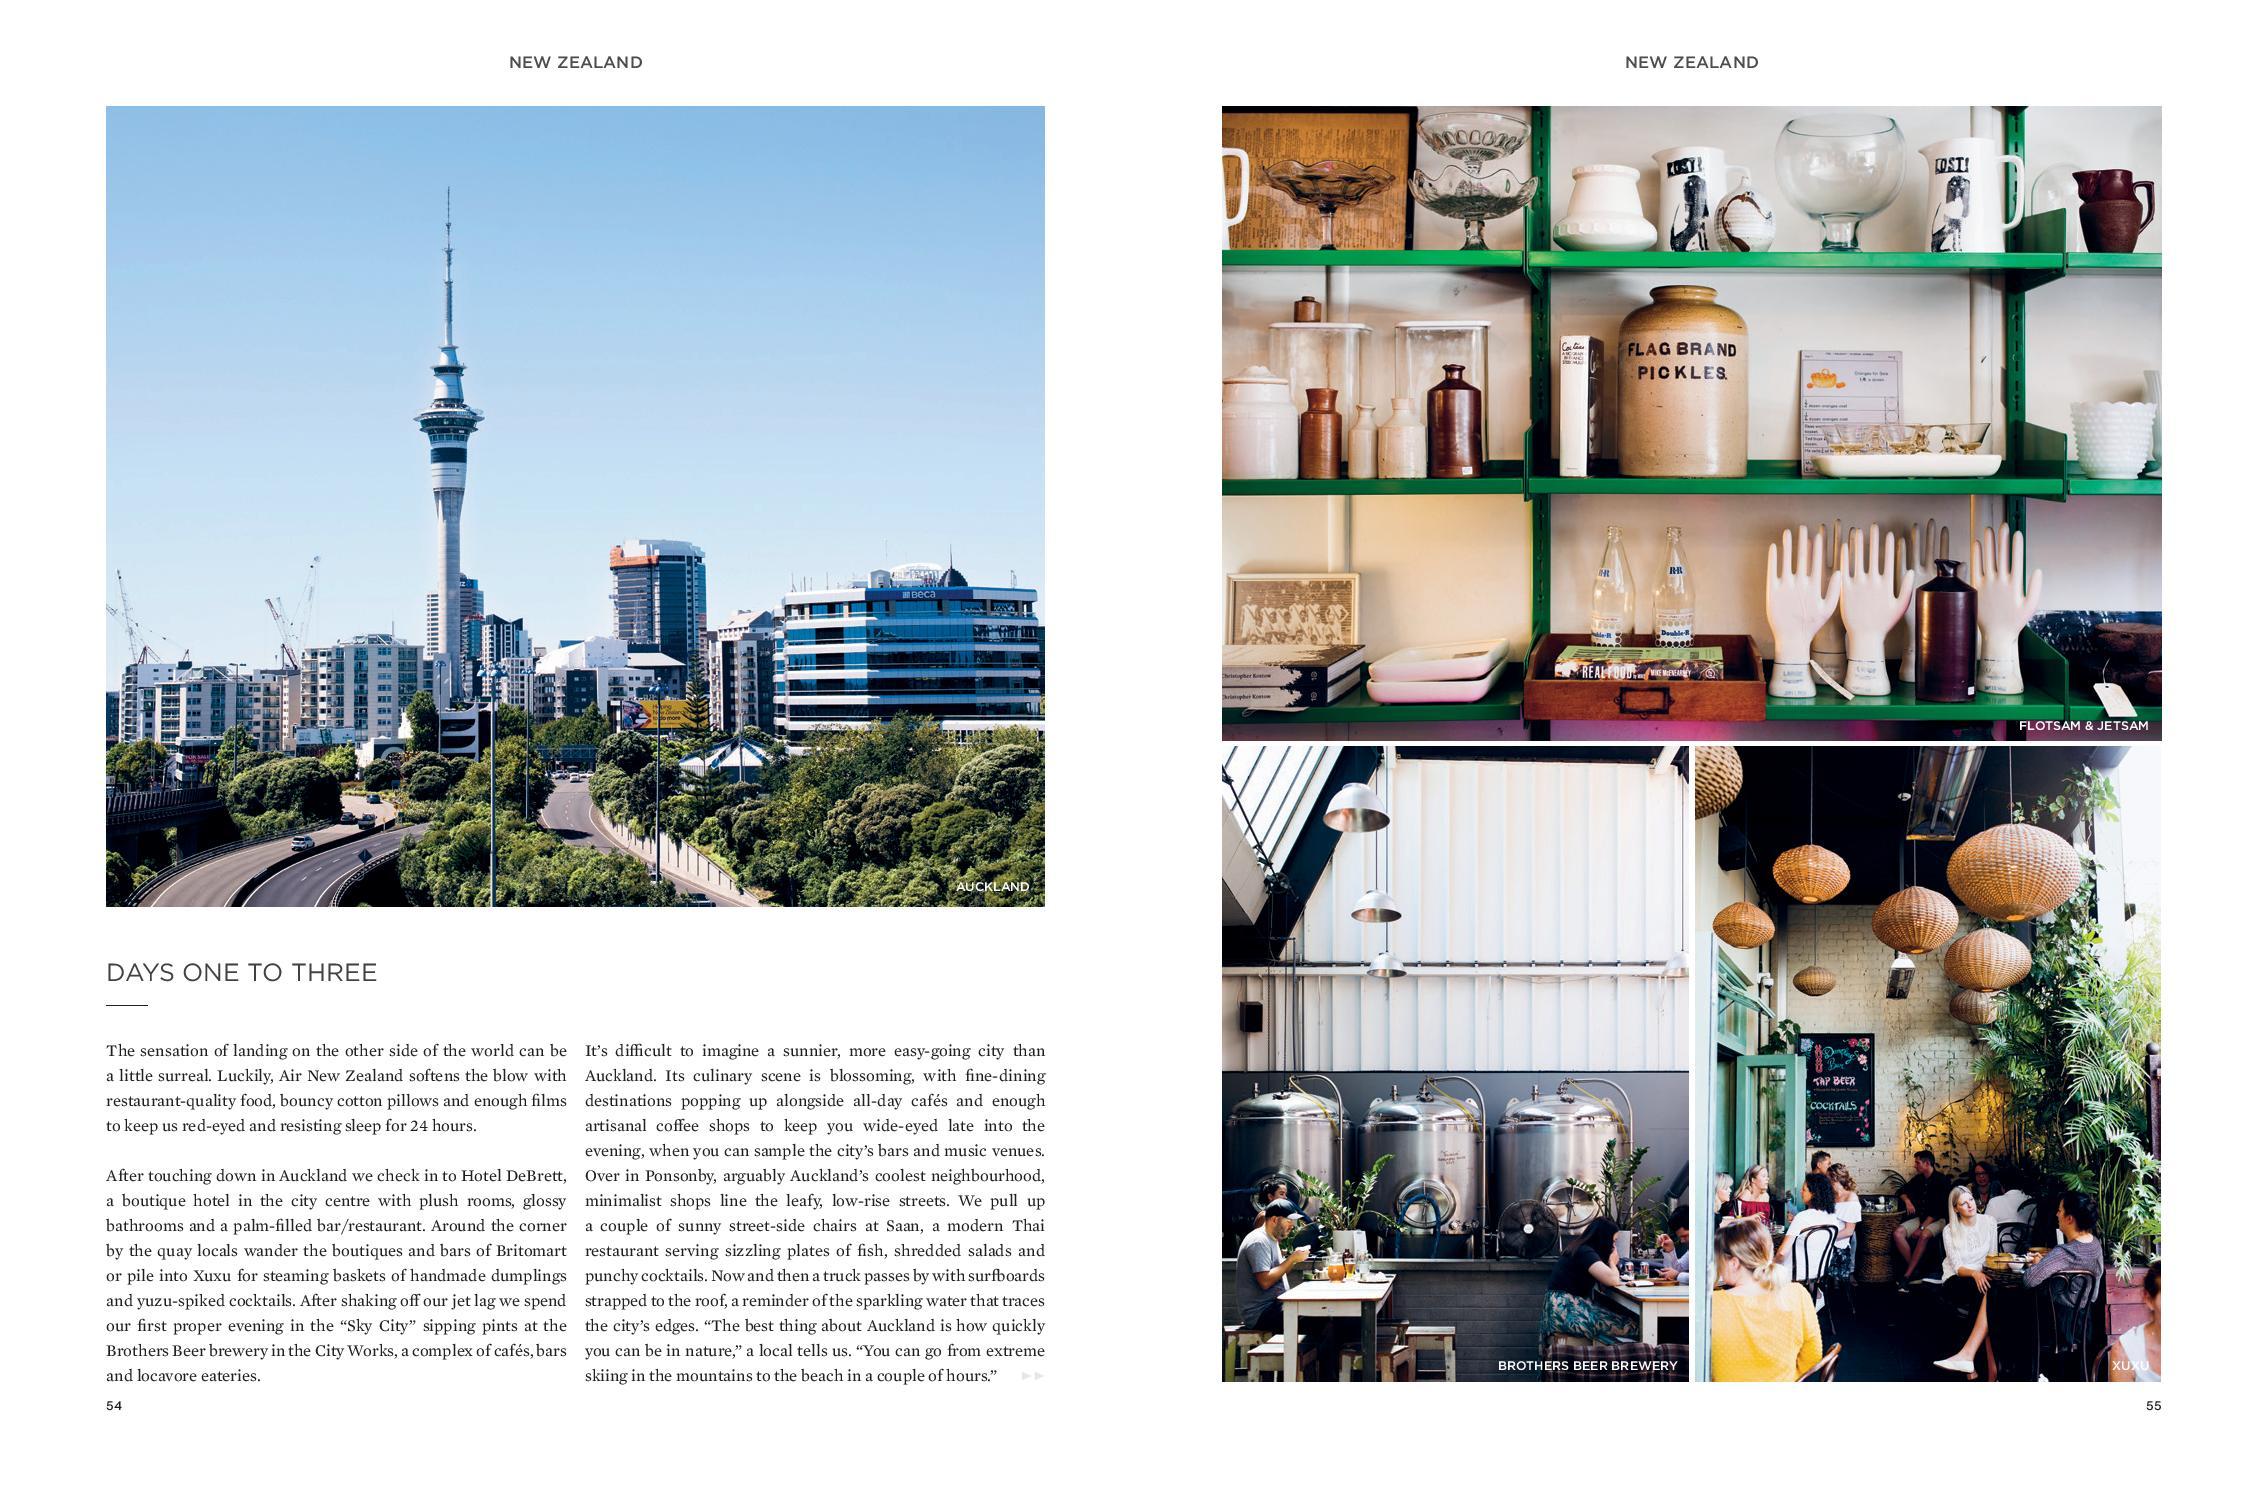 054-067-New_Zealand-page-002.jpg